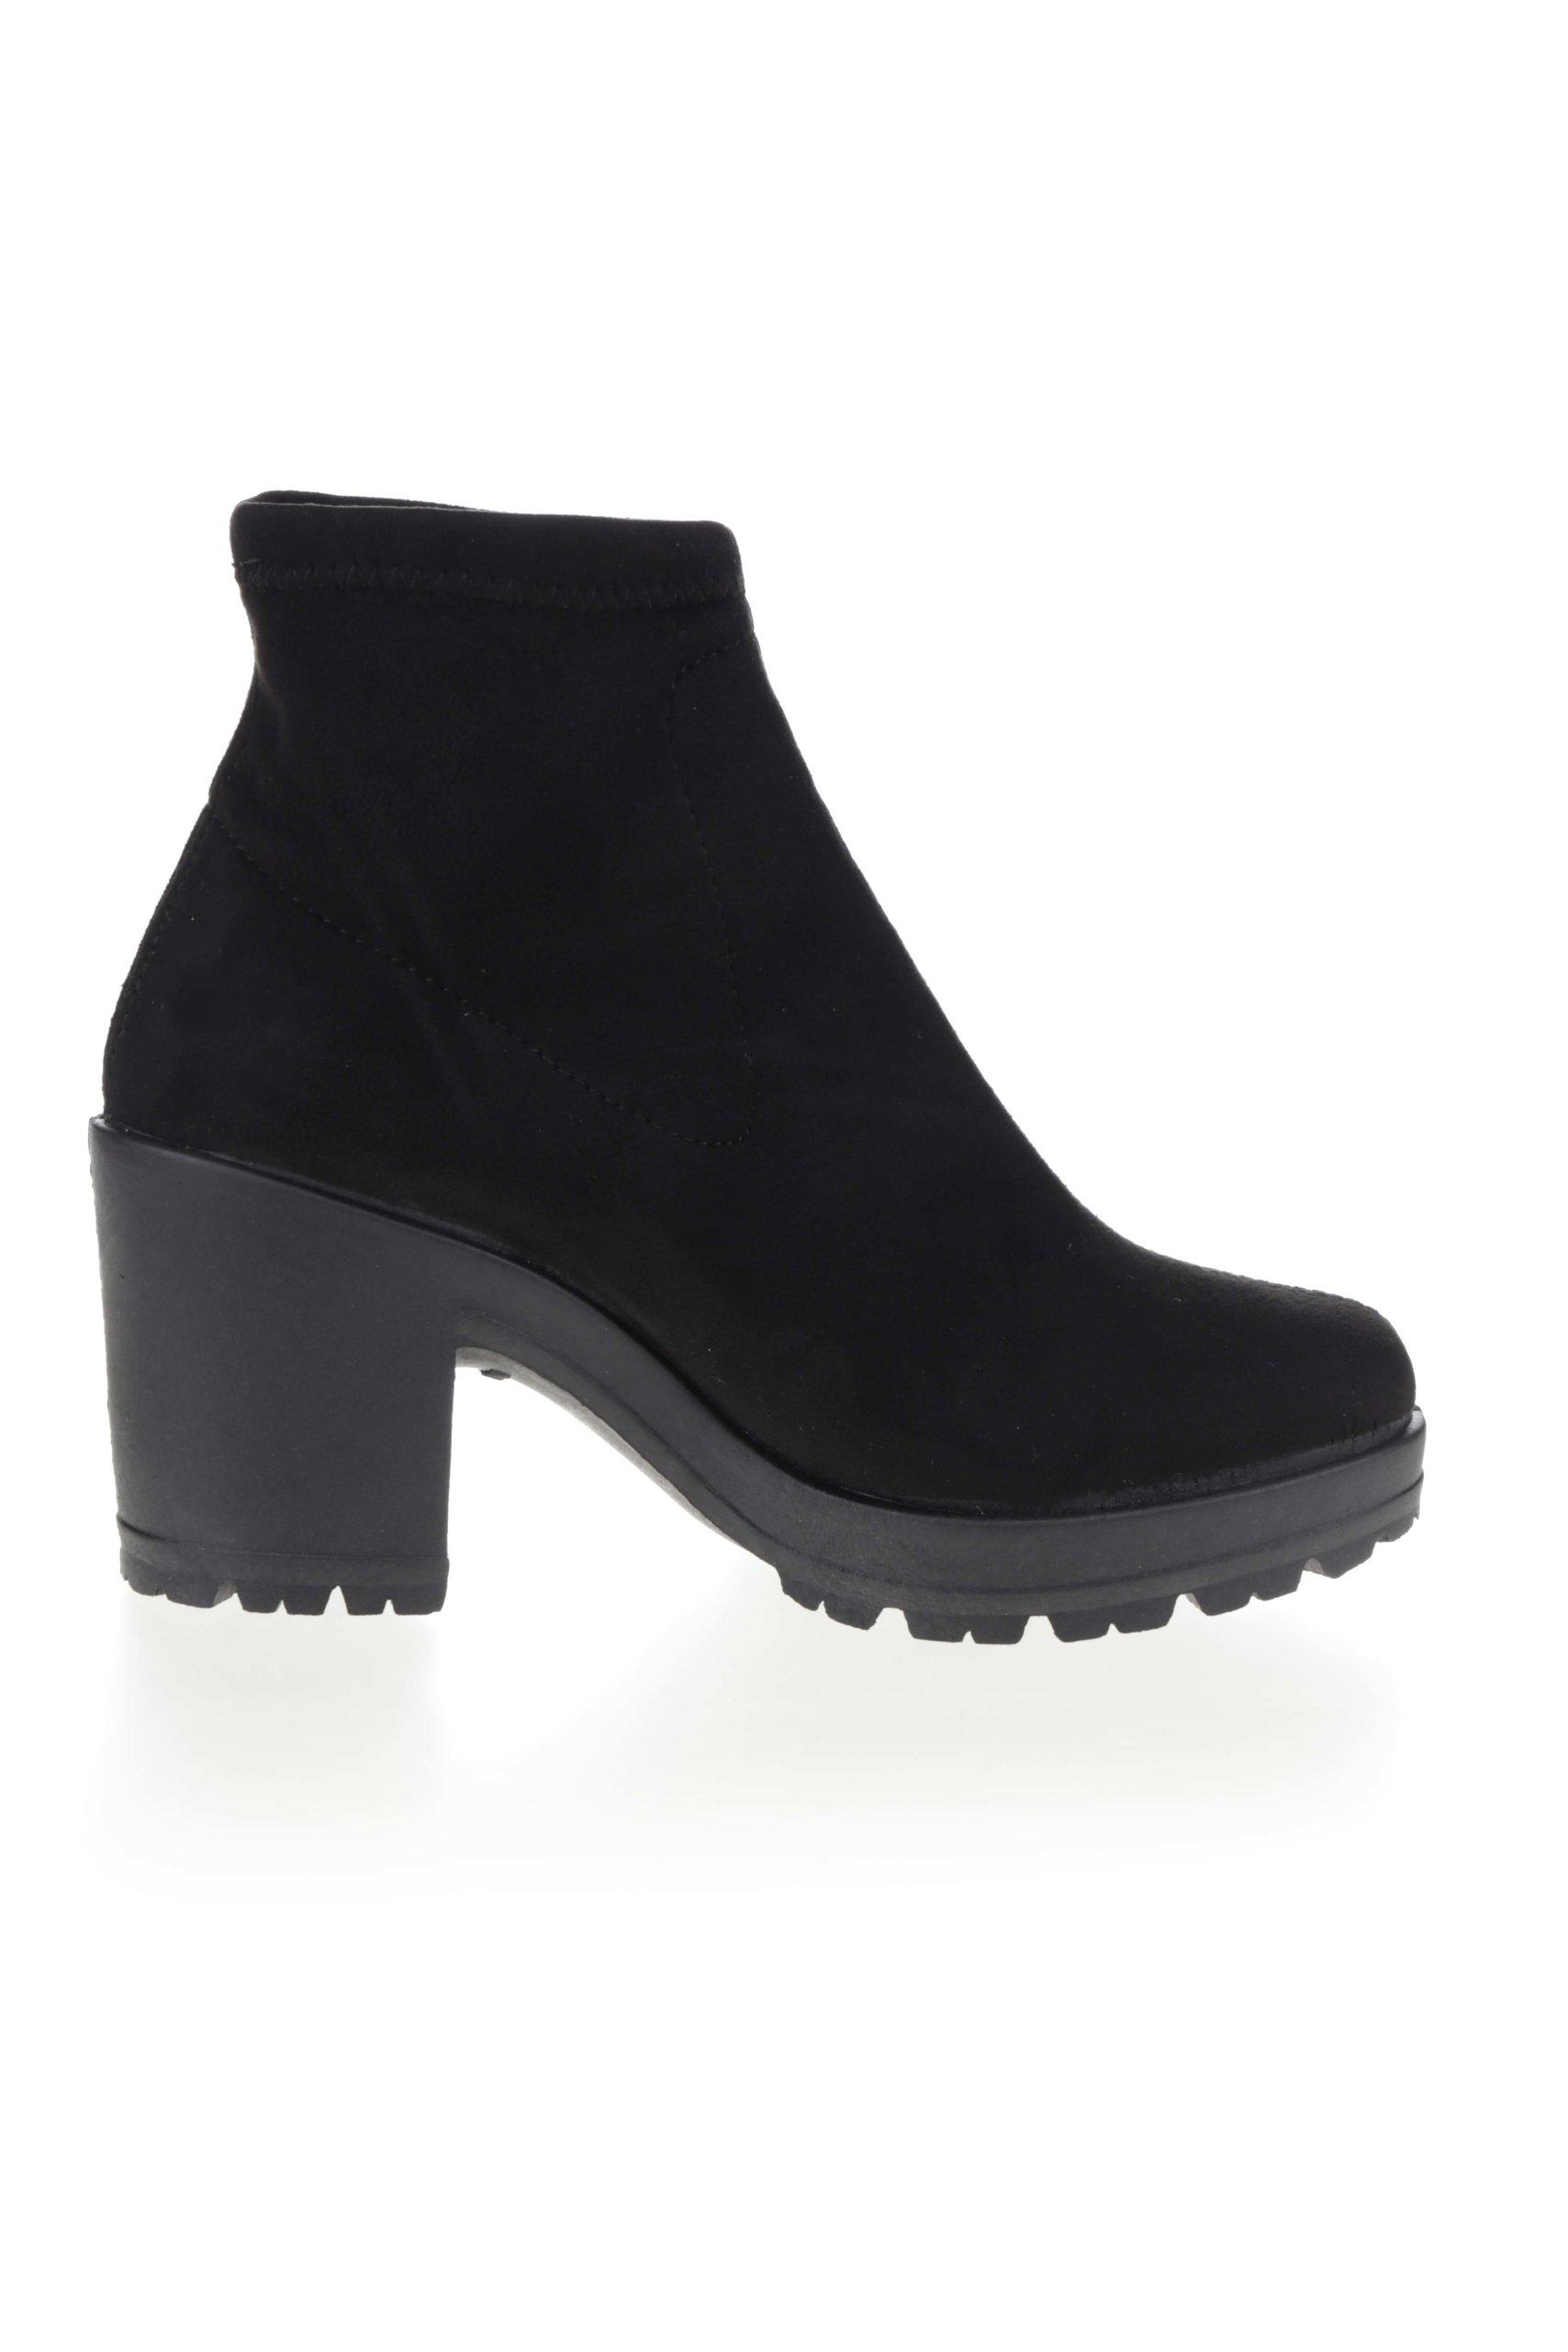 17e525452b010 Čierne členkové topánky v semišovej úprave na podpätku Miss Selfridge ...